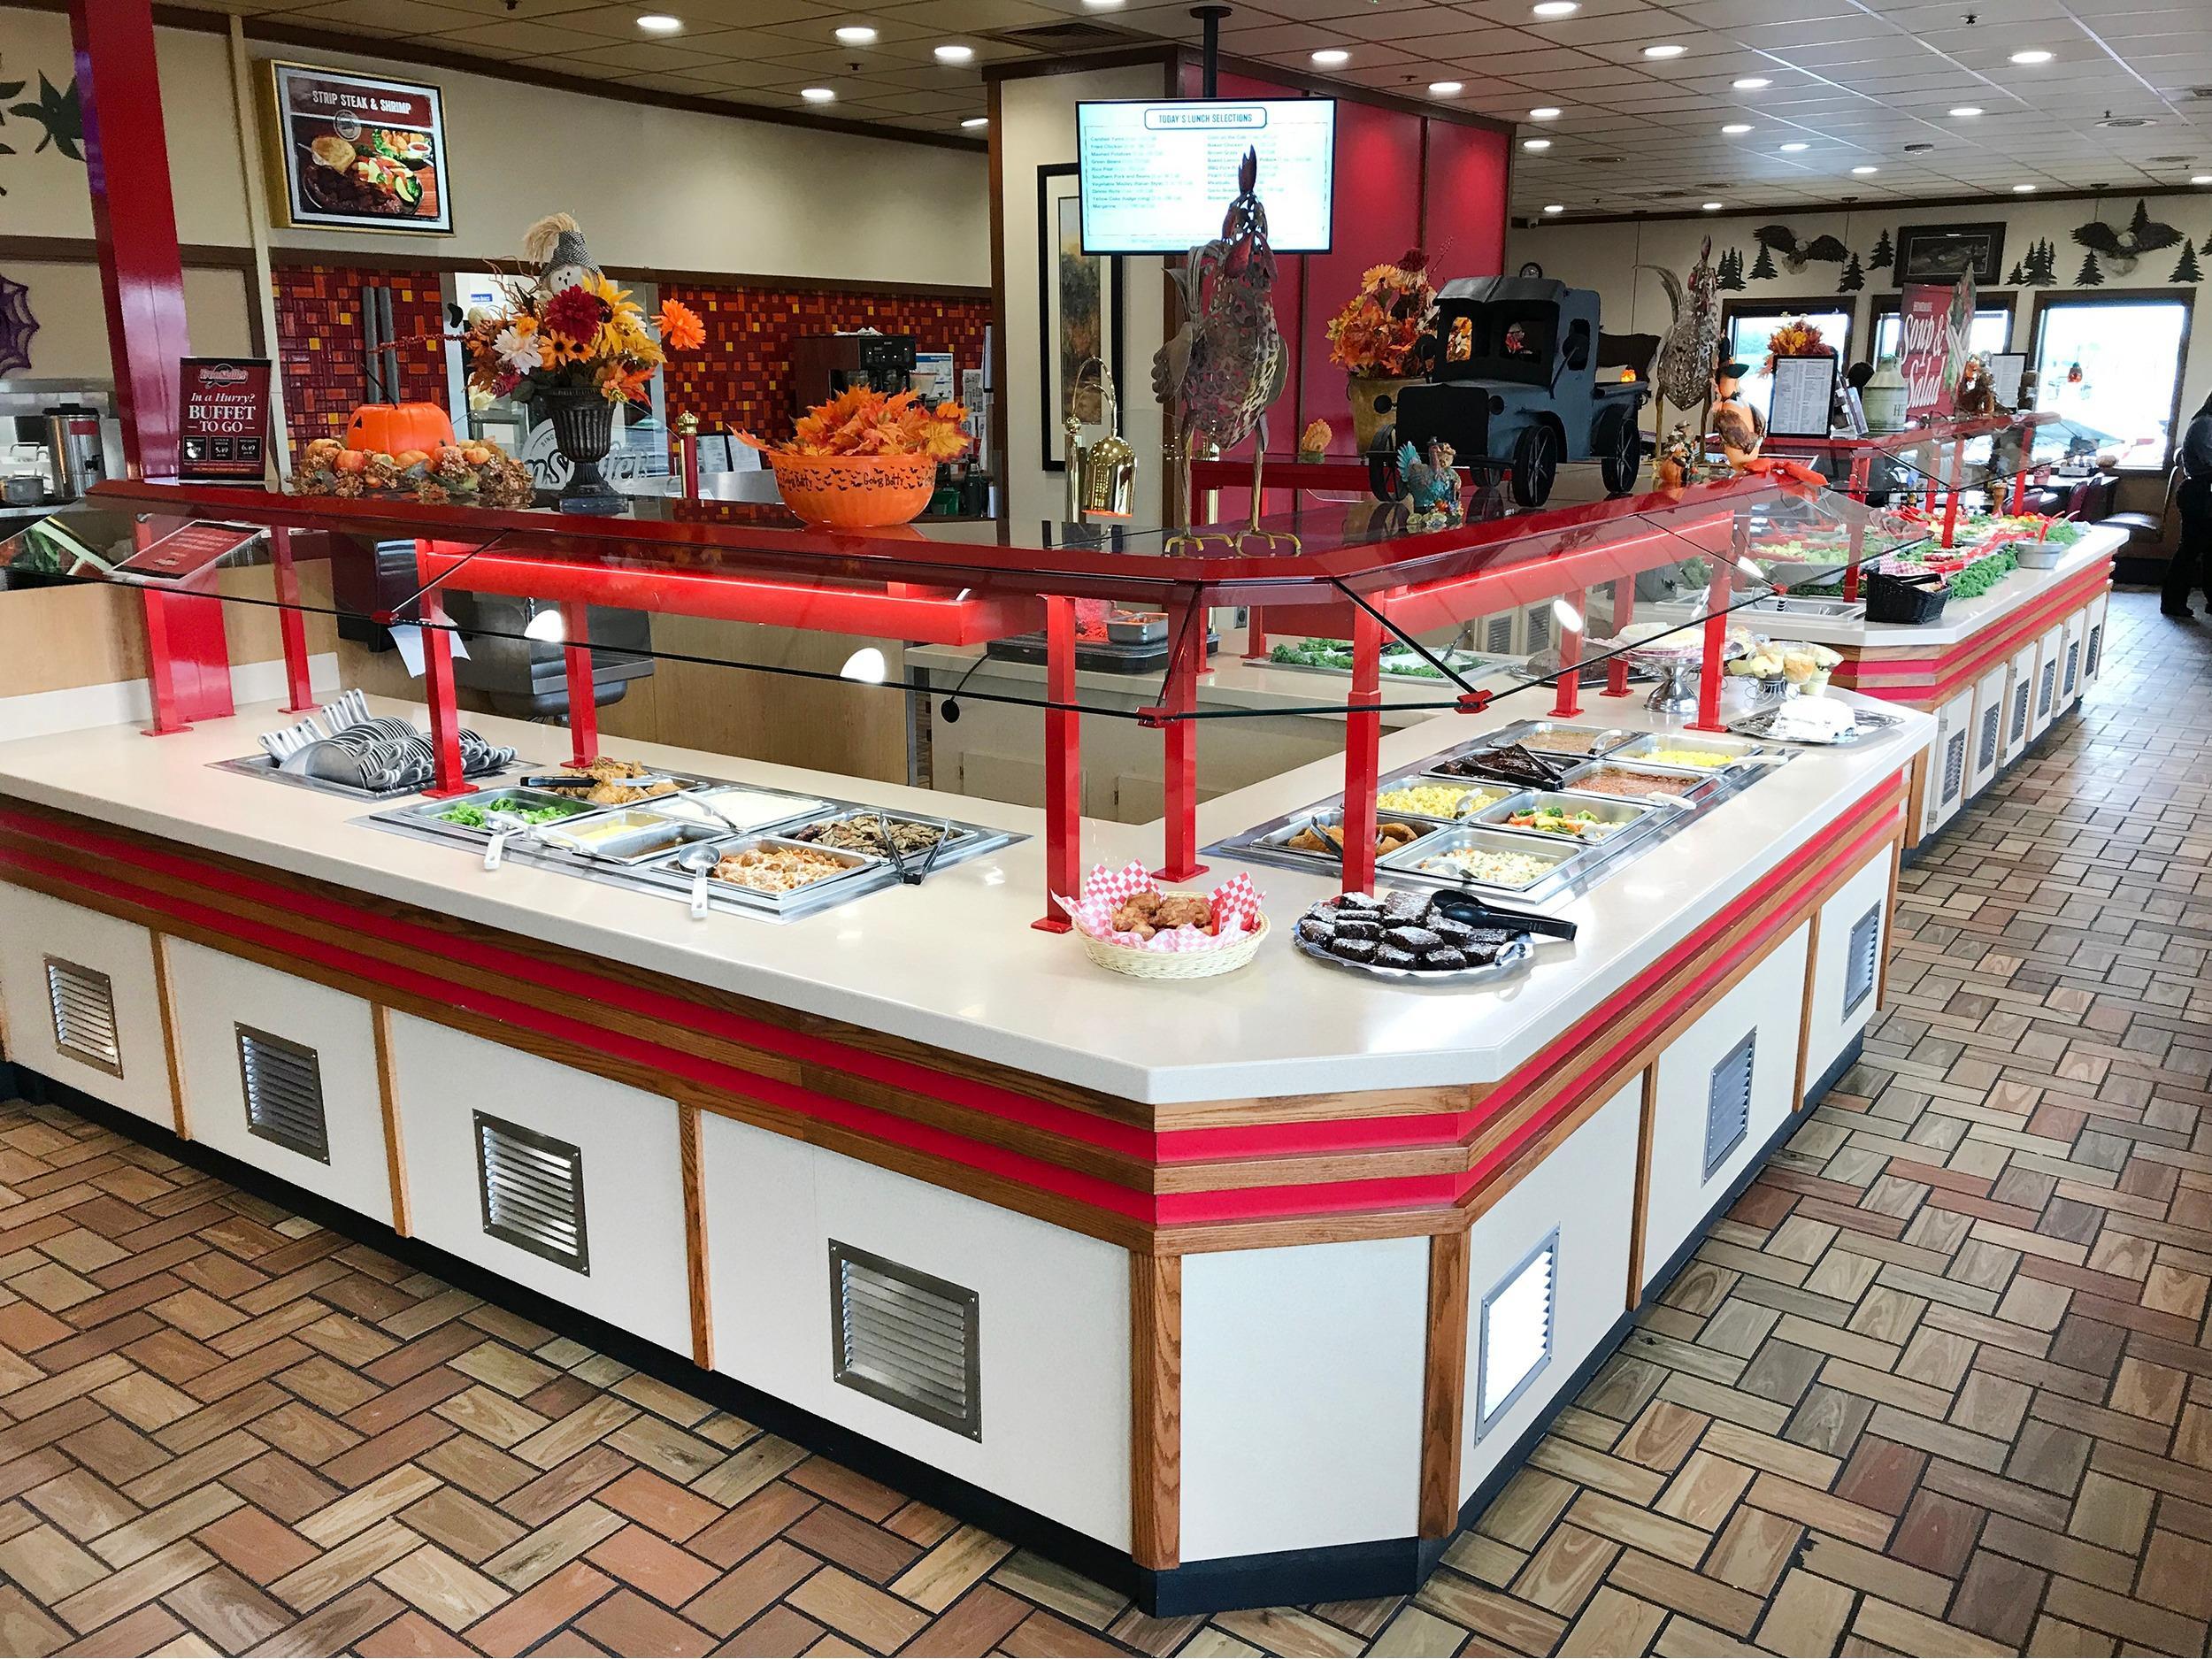 Iron Skillet Restaurant image 0